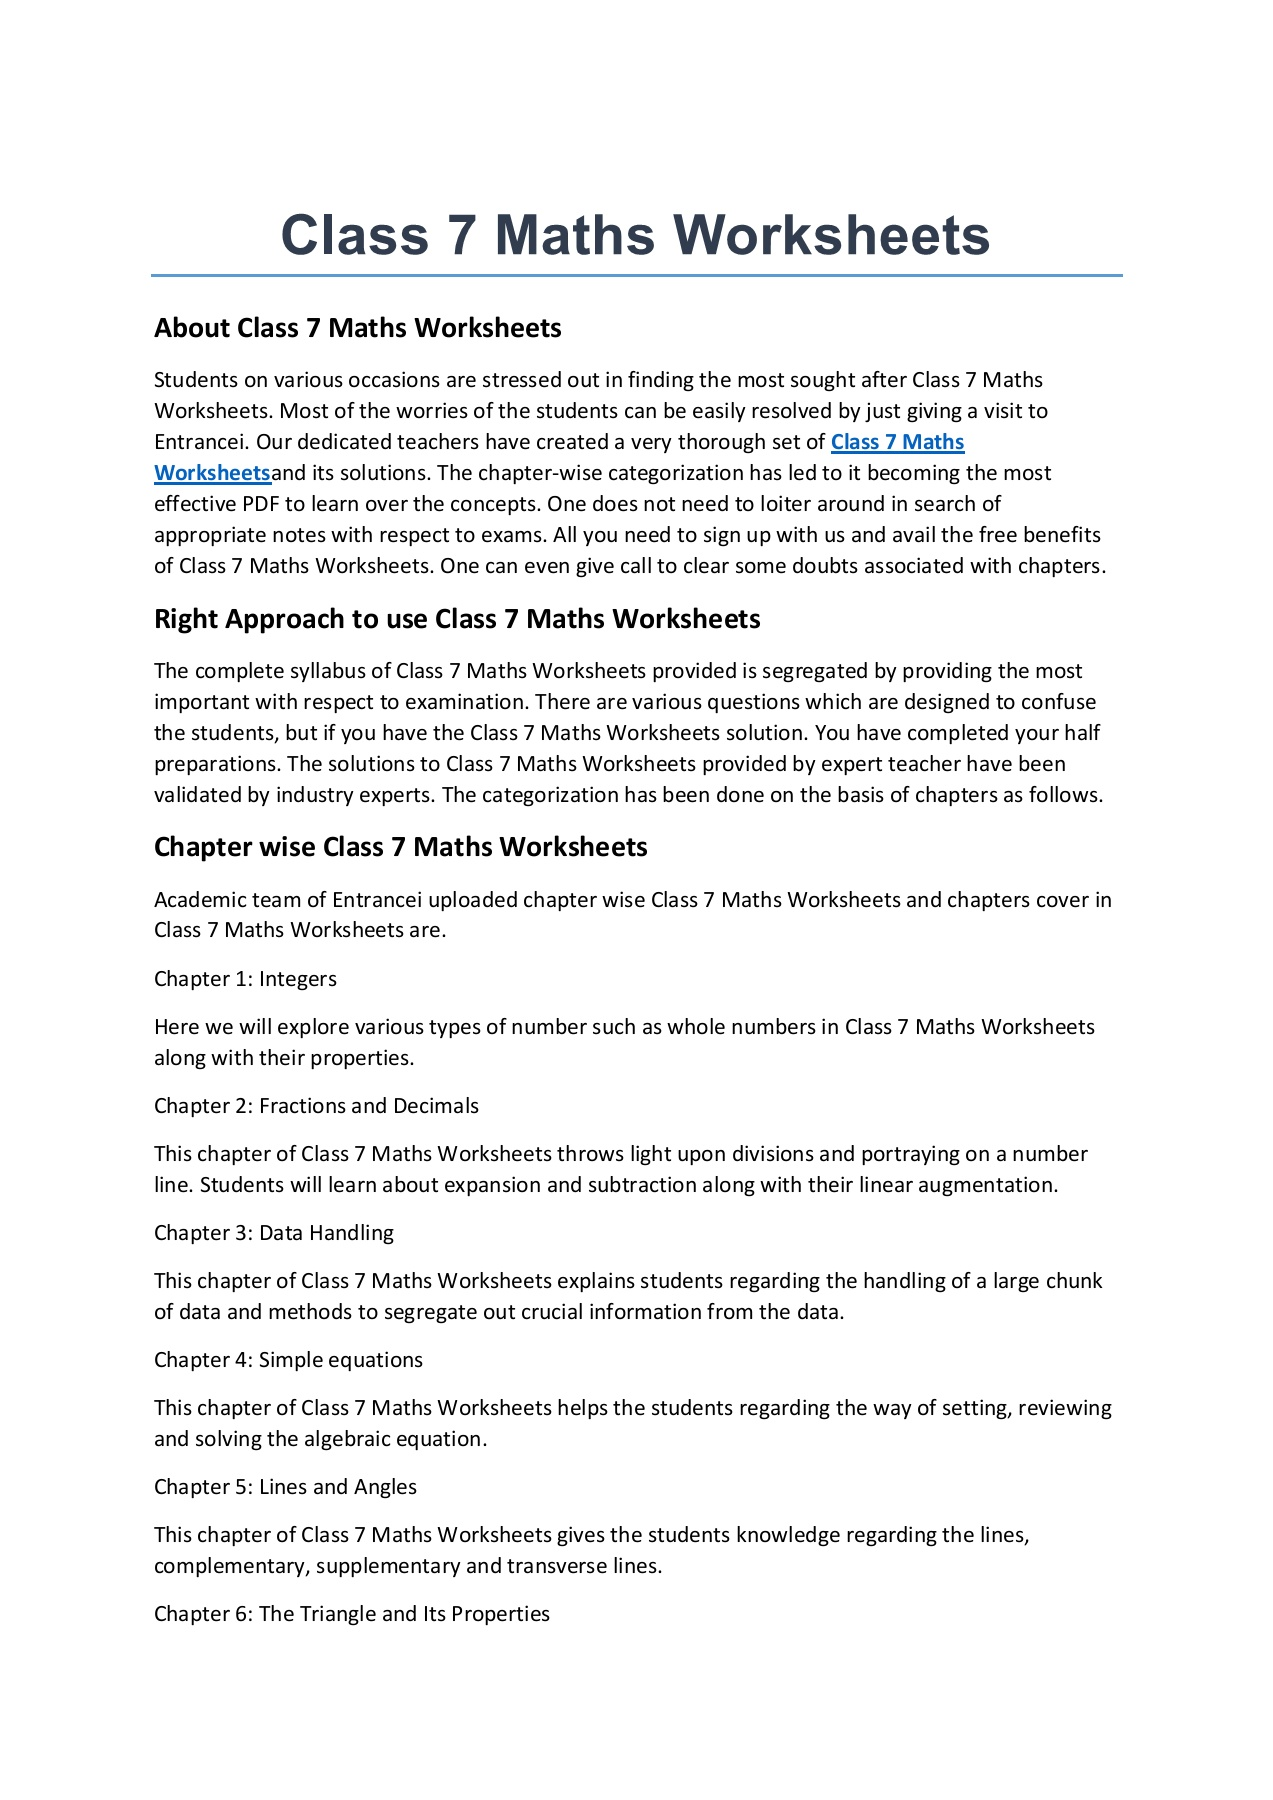 medium resolution of Class 7 Maths Worksheets-Flip eBook Pages 1 - 3  AnyFlip   AnyFlip